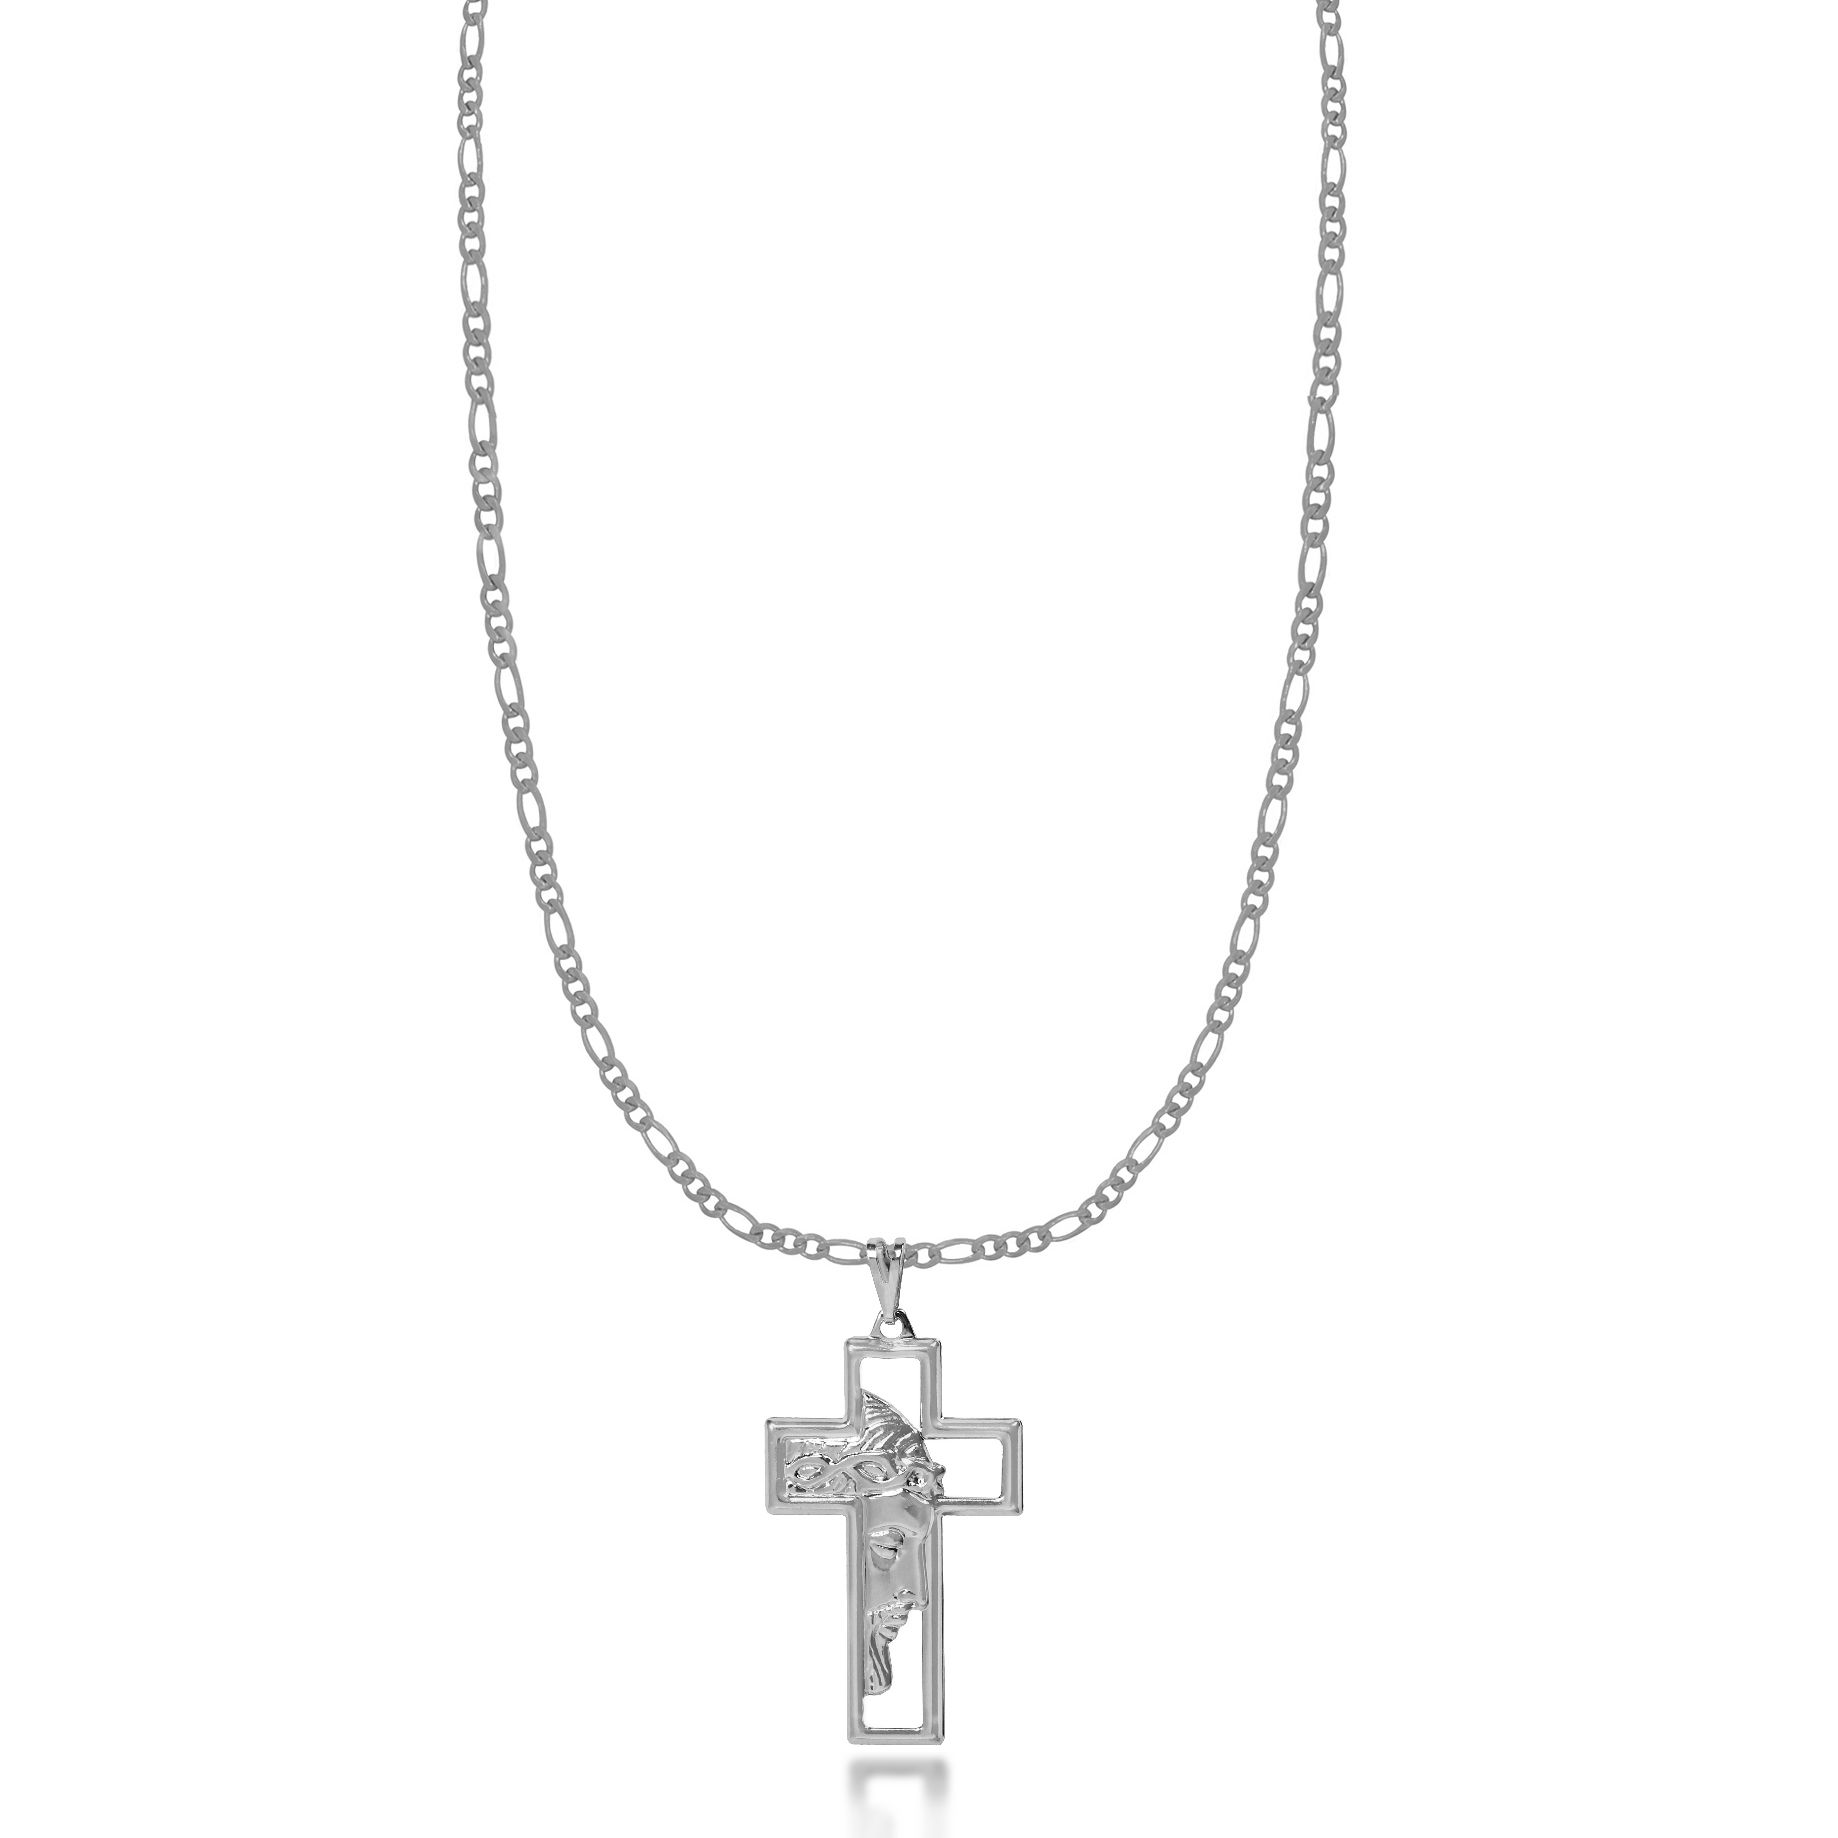 Corrente Masculina 3x1 Cruz Jesus Vazado Folheado Prata 1000  - Lunozê Joias